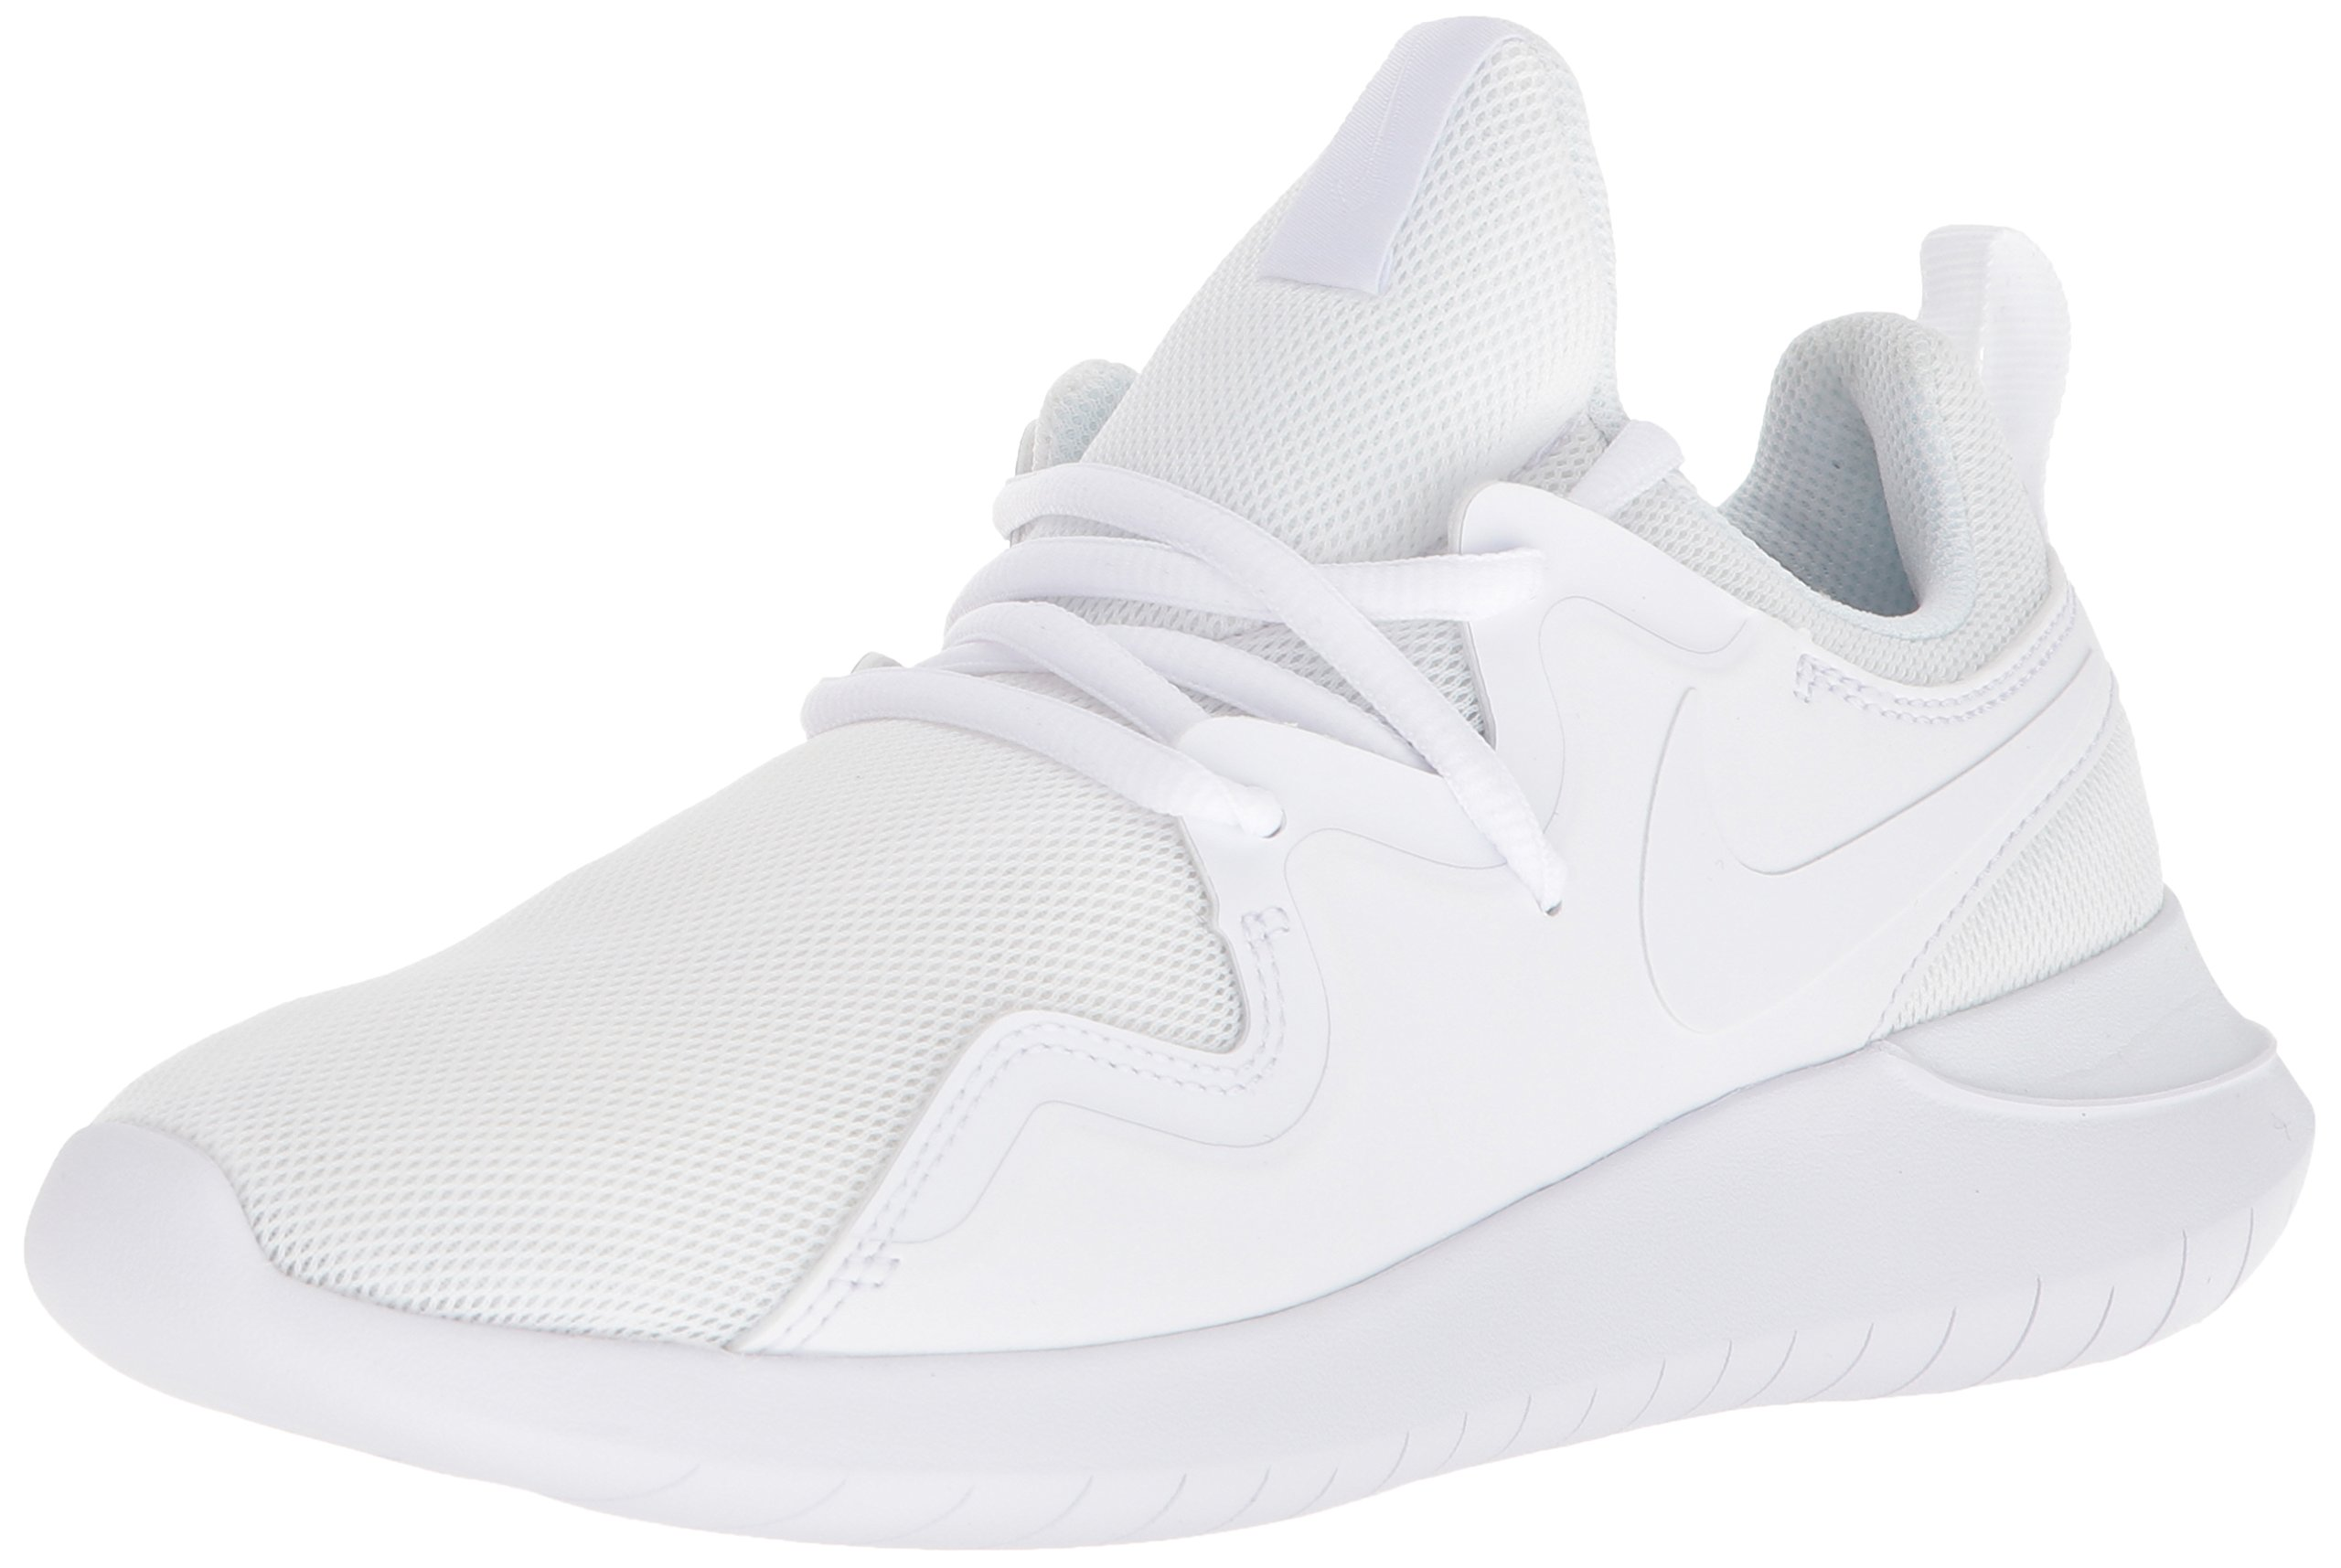 NIKE Women's Tessen Running Shoe, White/White-Black, 7 Regular US